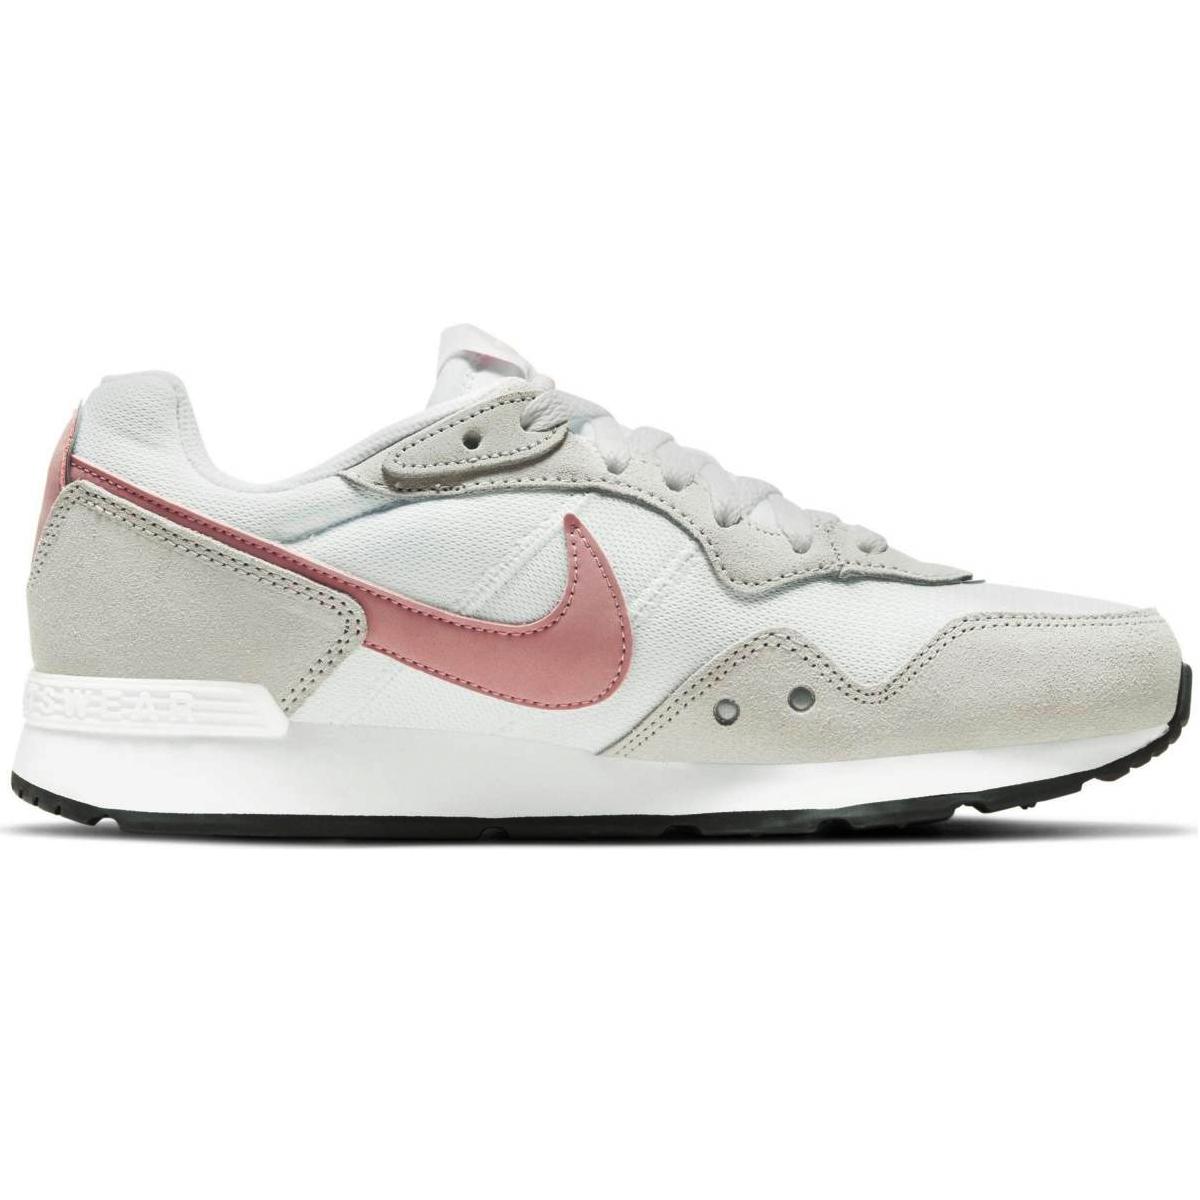 Nike WMNS Venture Runner Retro Sneaker weiß rosa CK2948 104